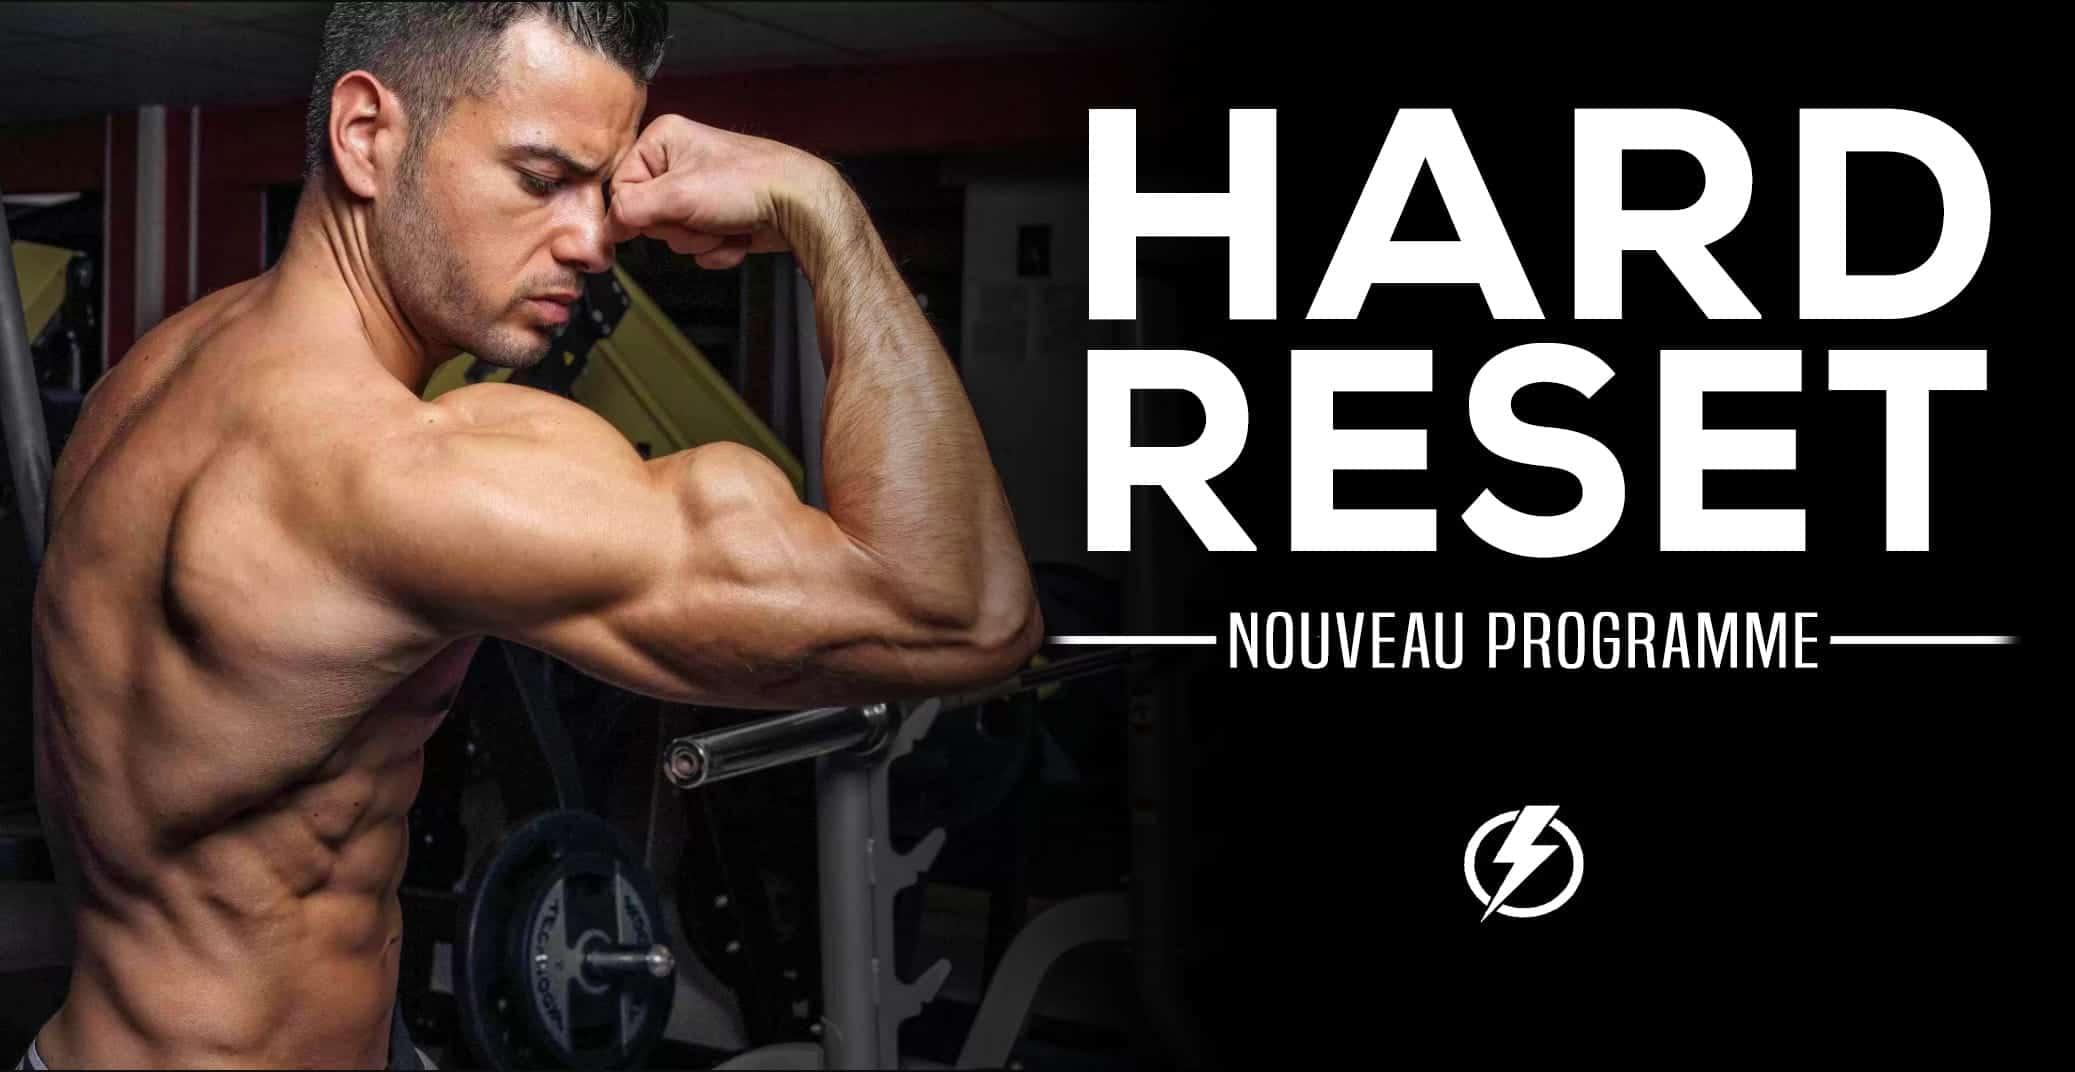 Programme Hard Reset : L'entrainement des légendes en musculation